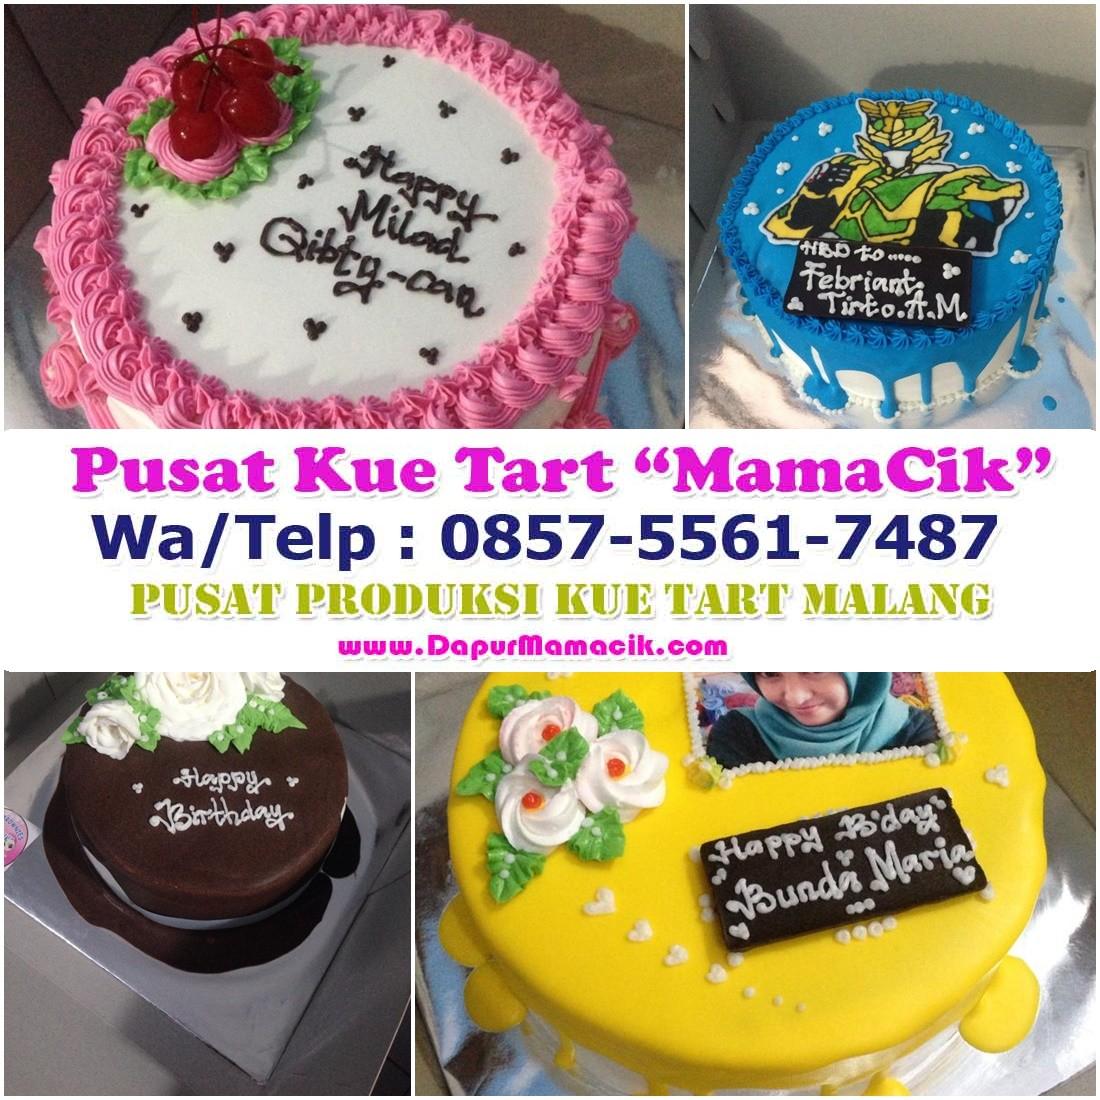 085755617487 Kue Ulang Tahun Delivery Murah Malang Kota Toko Kue Tart Dapur Mamacik 085755617487 Jual Kue Tart Enak Di Malang Kota Toko Kue Tart Dapur Mamacik